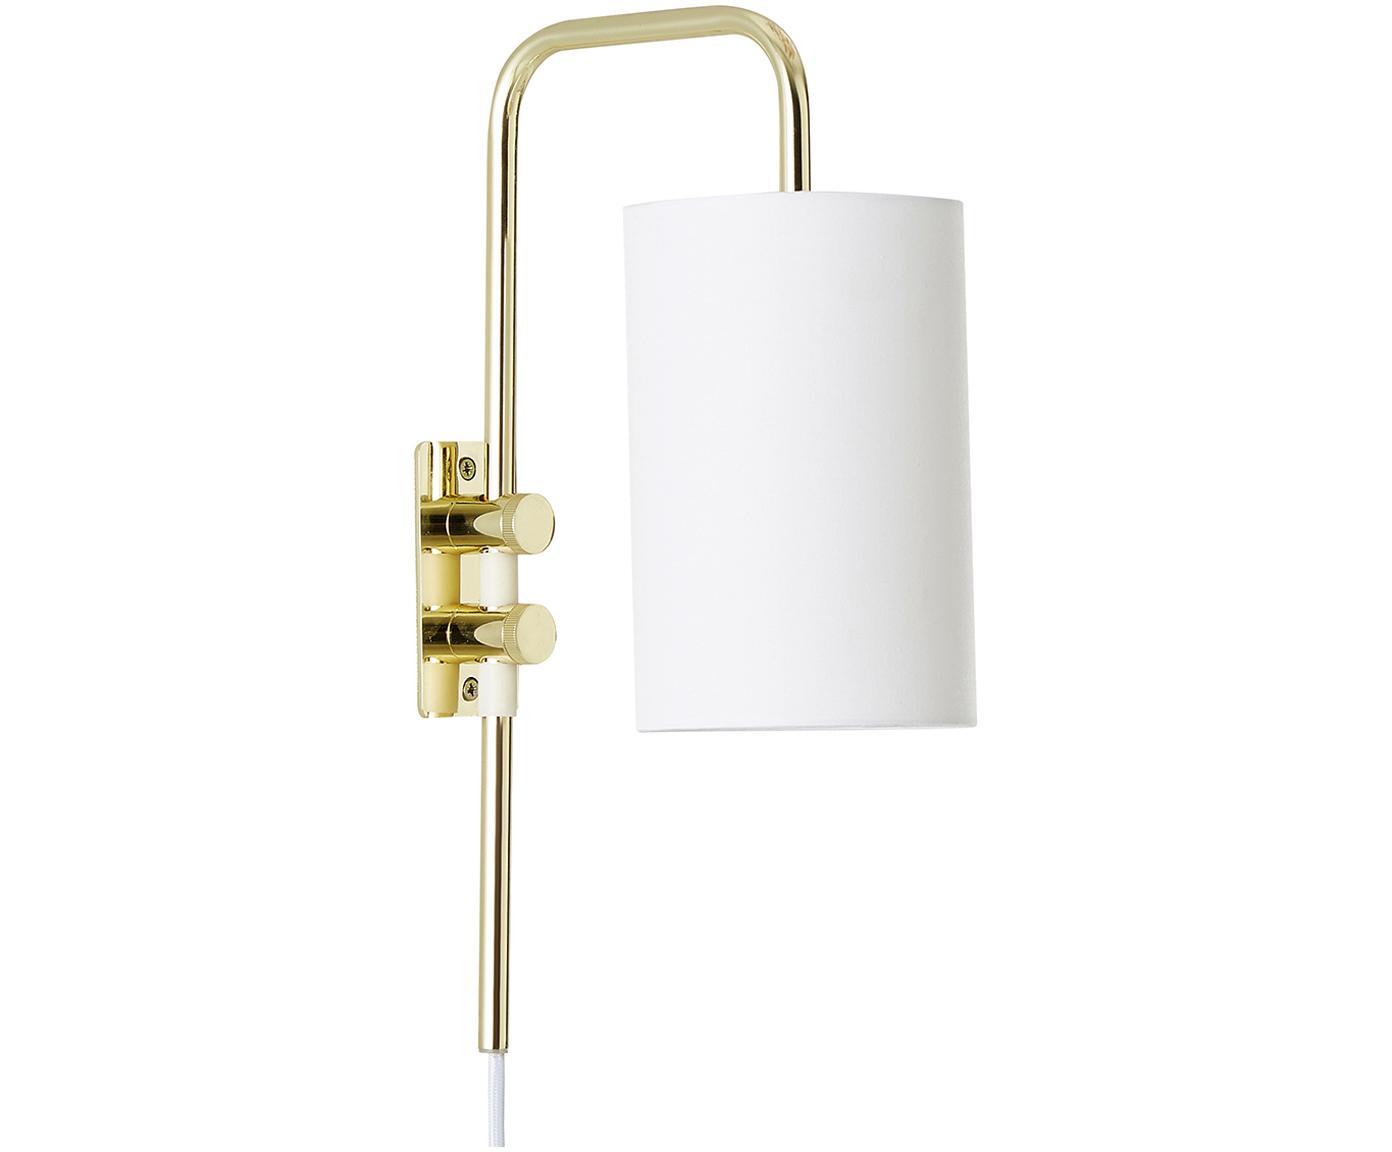 Wandlamp Isa met stekker, Lampenkap: katoenmix, Lampframe: glanzend goudkleurig. Lampenkap: wit, 12 x 38 cm